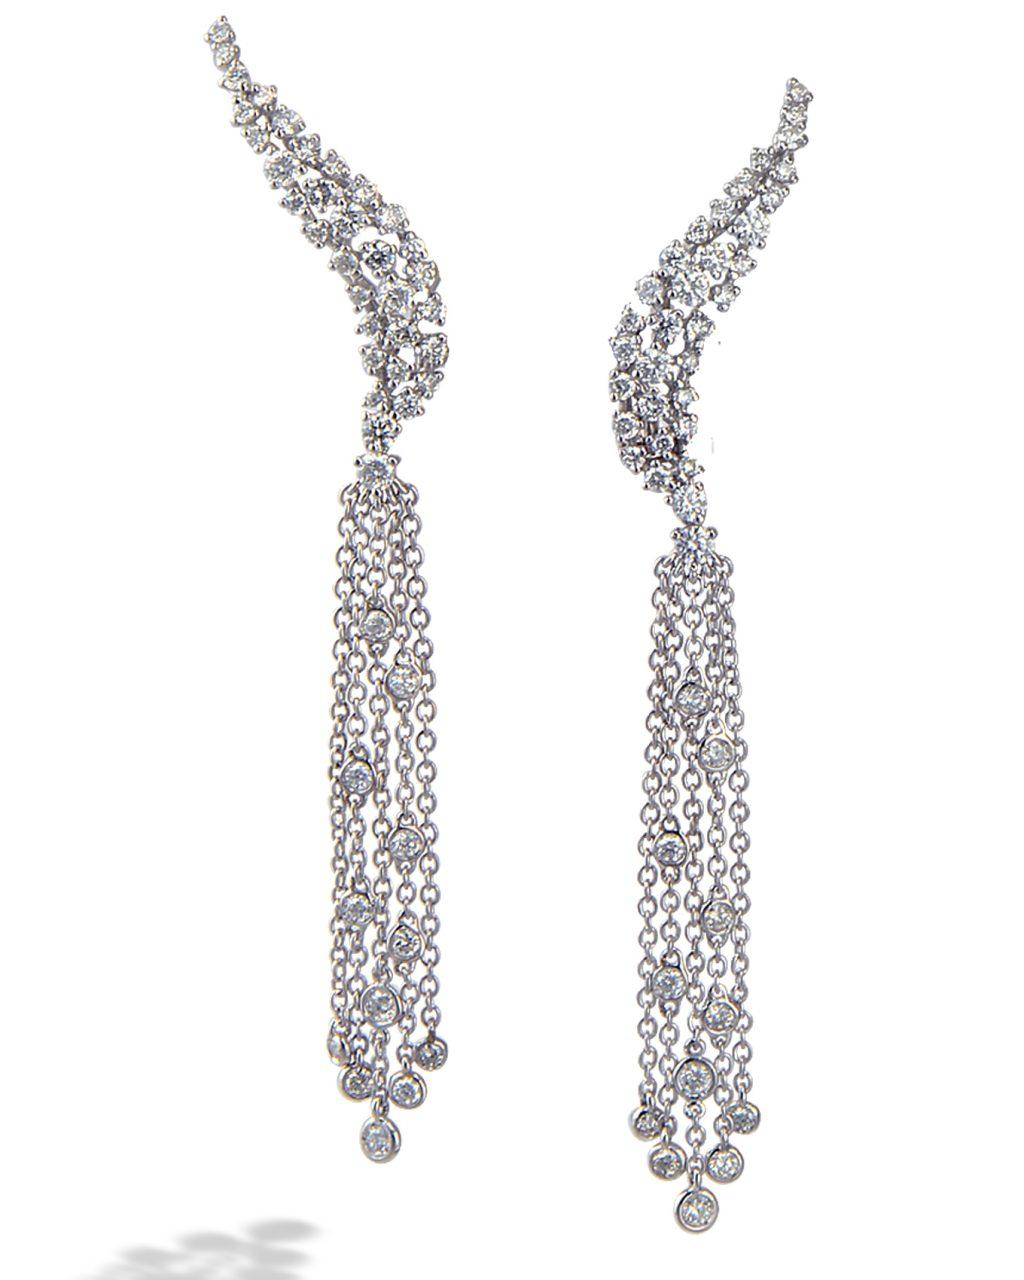 Diamond earrings by Casato Roma